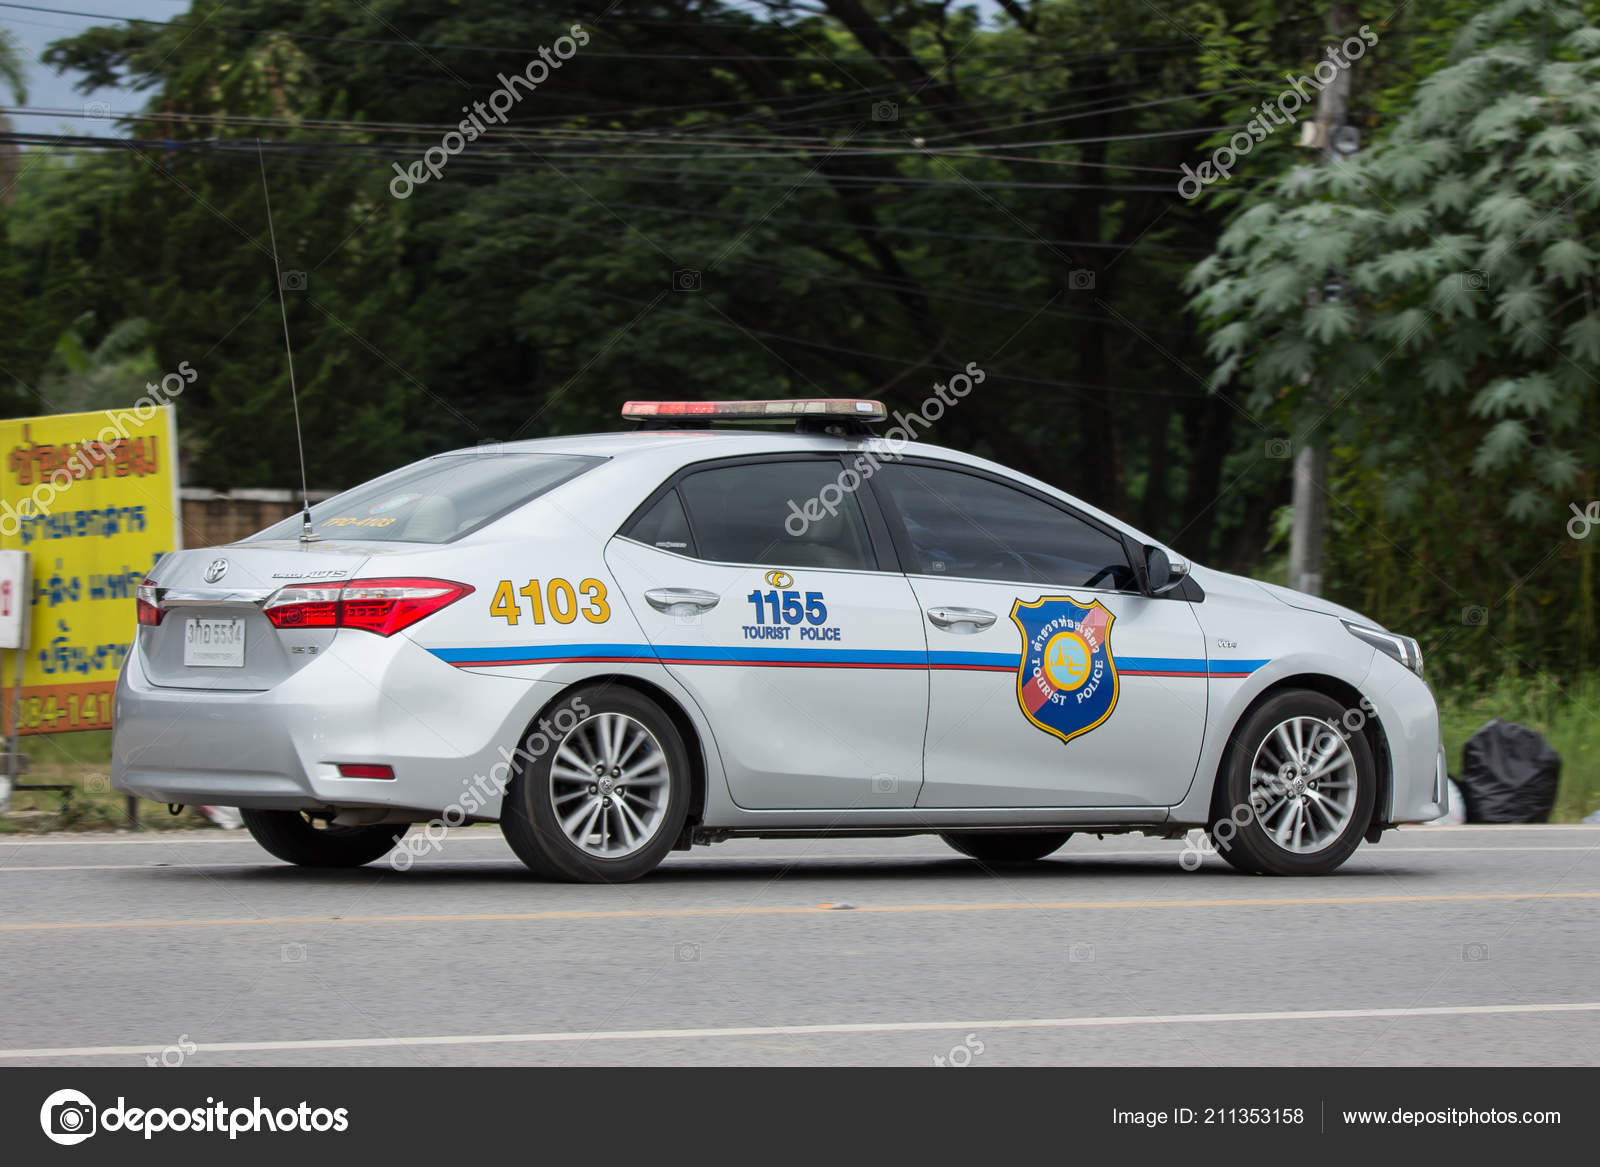 Chiangmai Thailand August 2018 Police Car Tourist Police